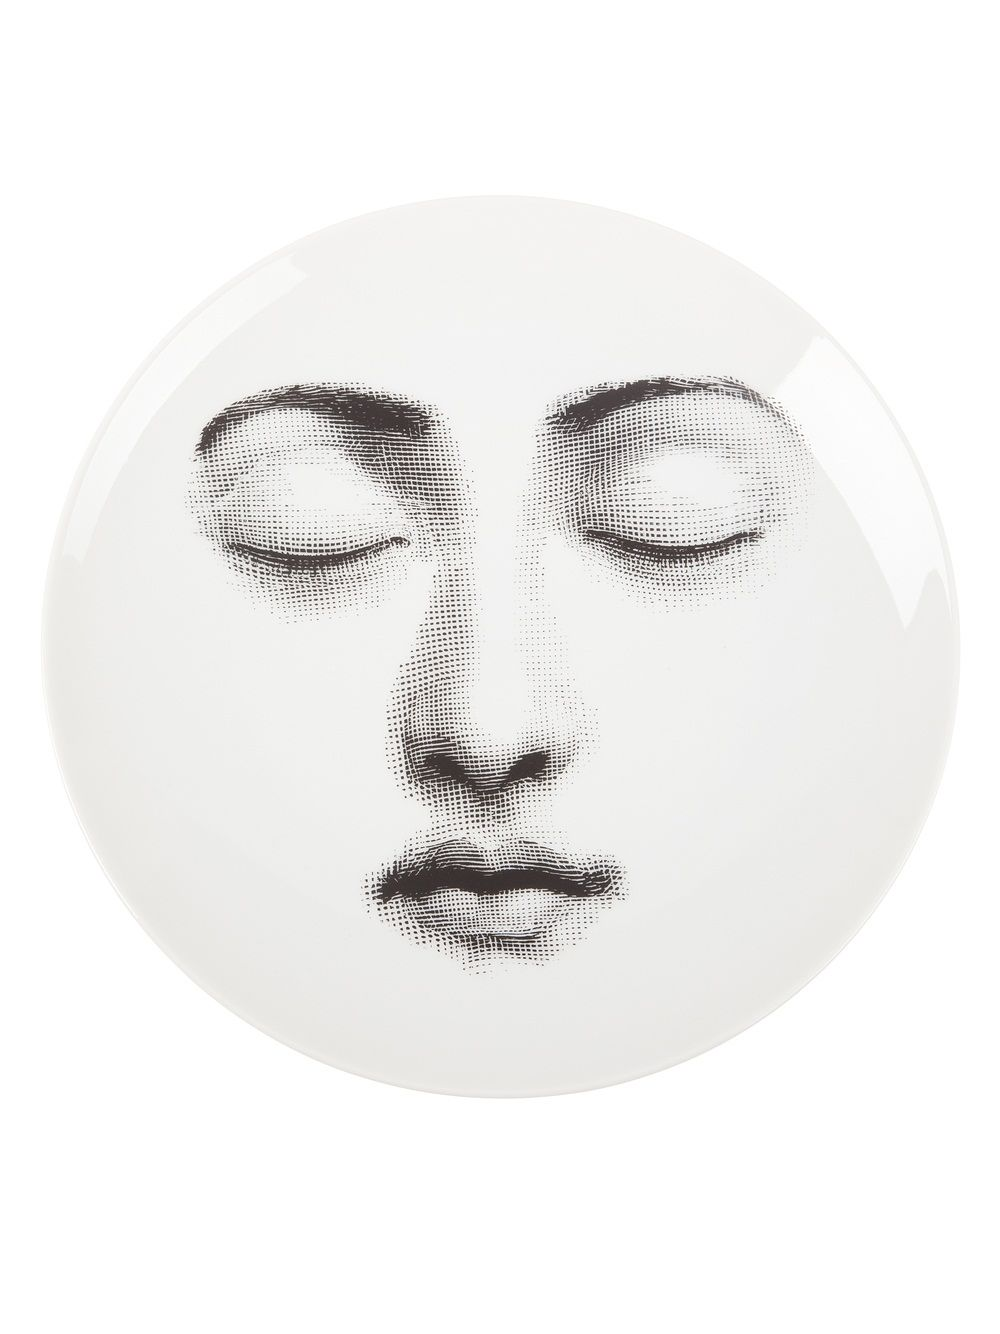 Art faces · Fornasetti decorative plate  sc 1 st  Pinterest & Fornasetti decorative plate | Stuff that inspires me | Pinterest ...